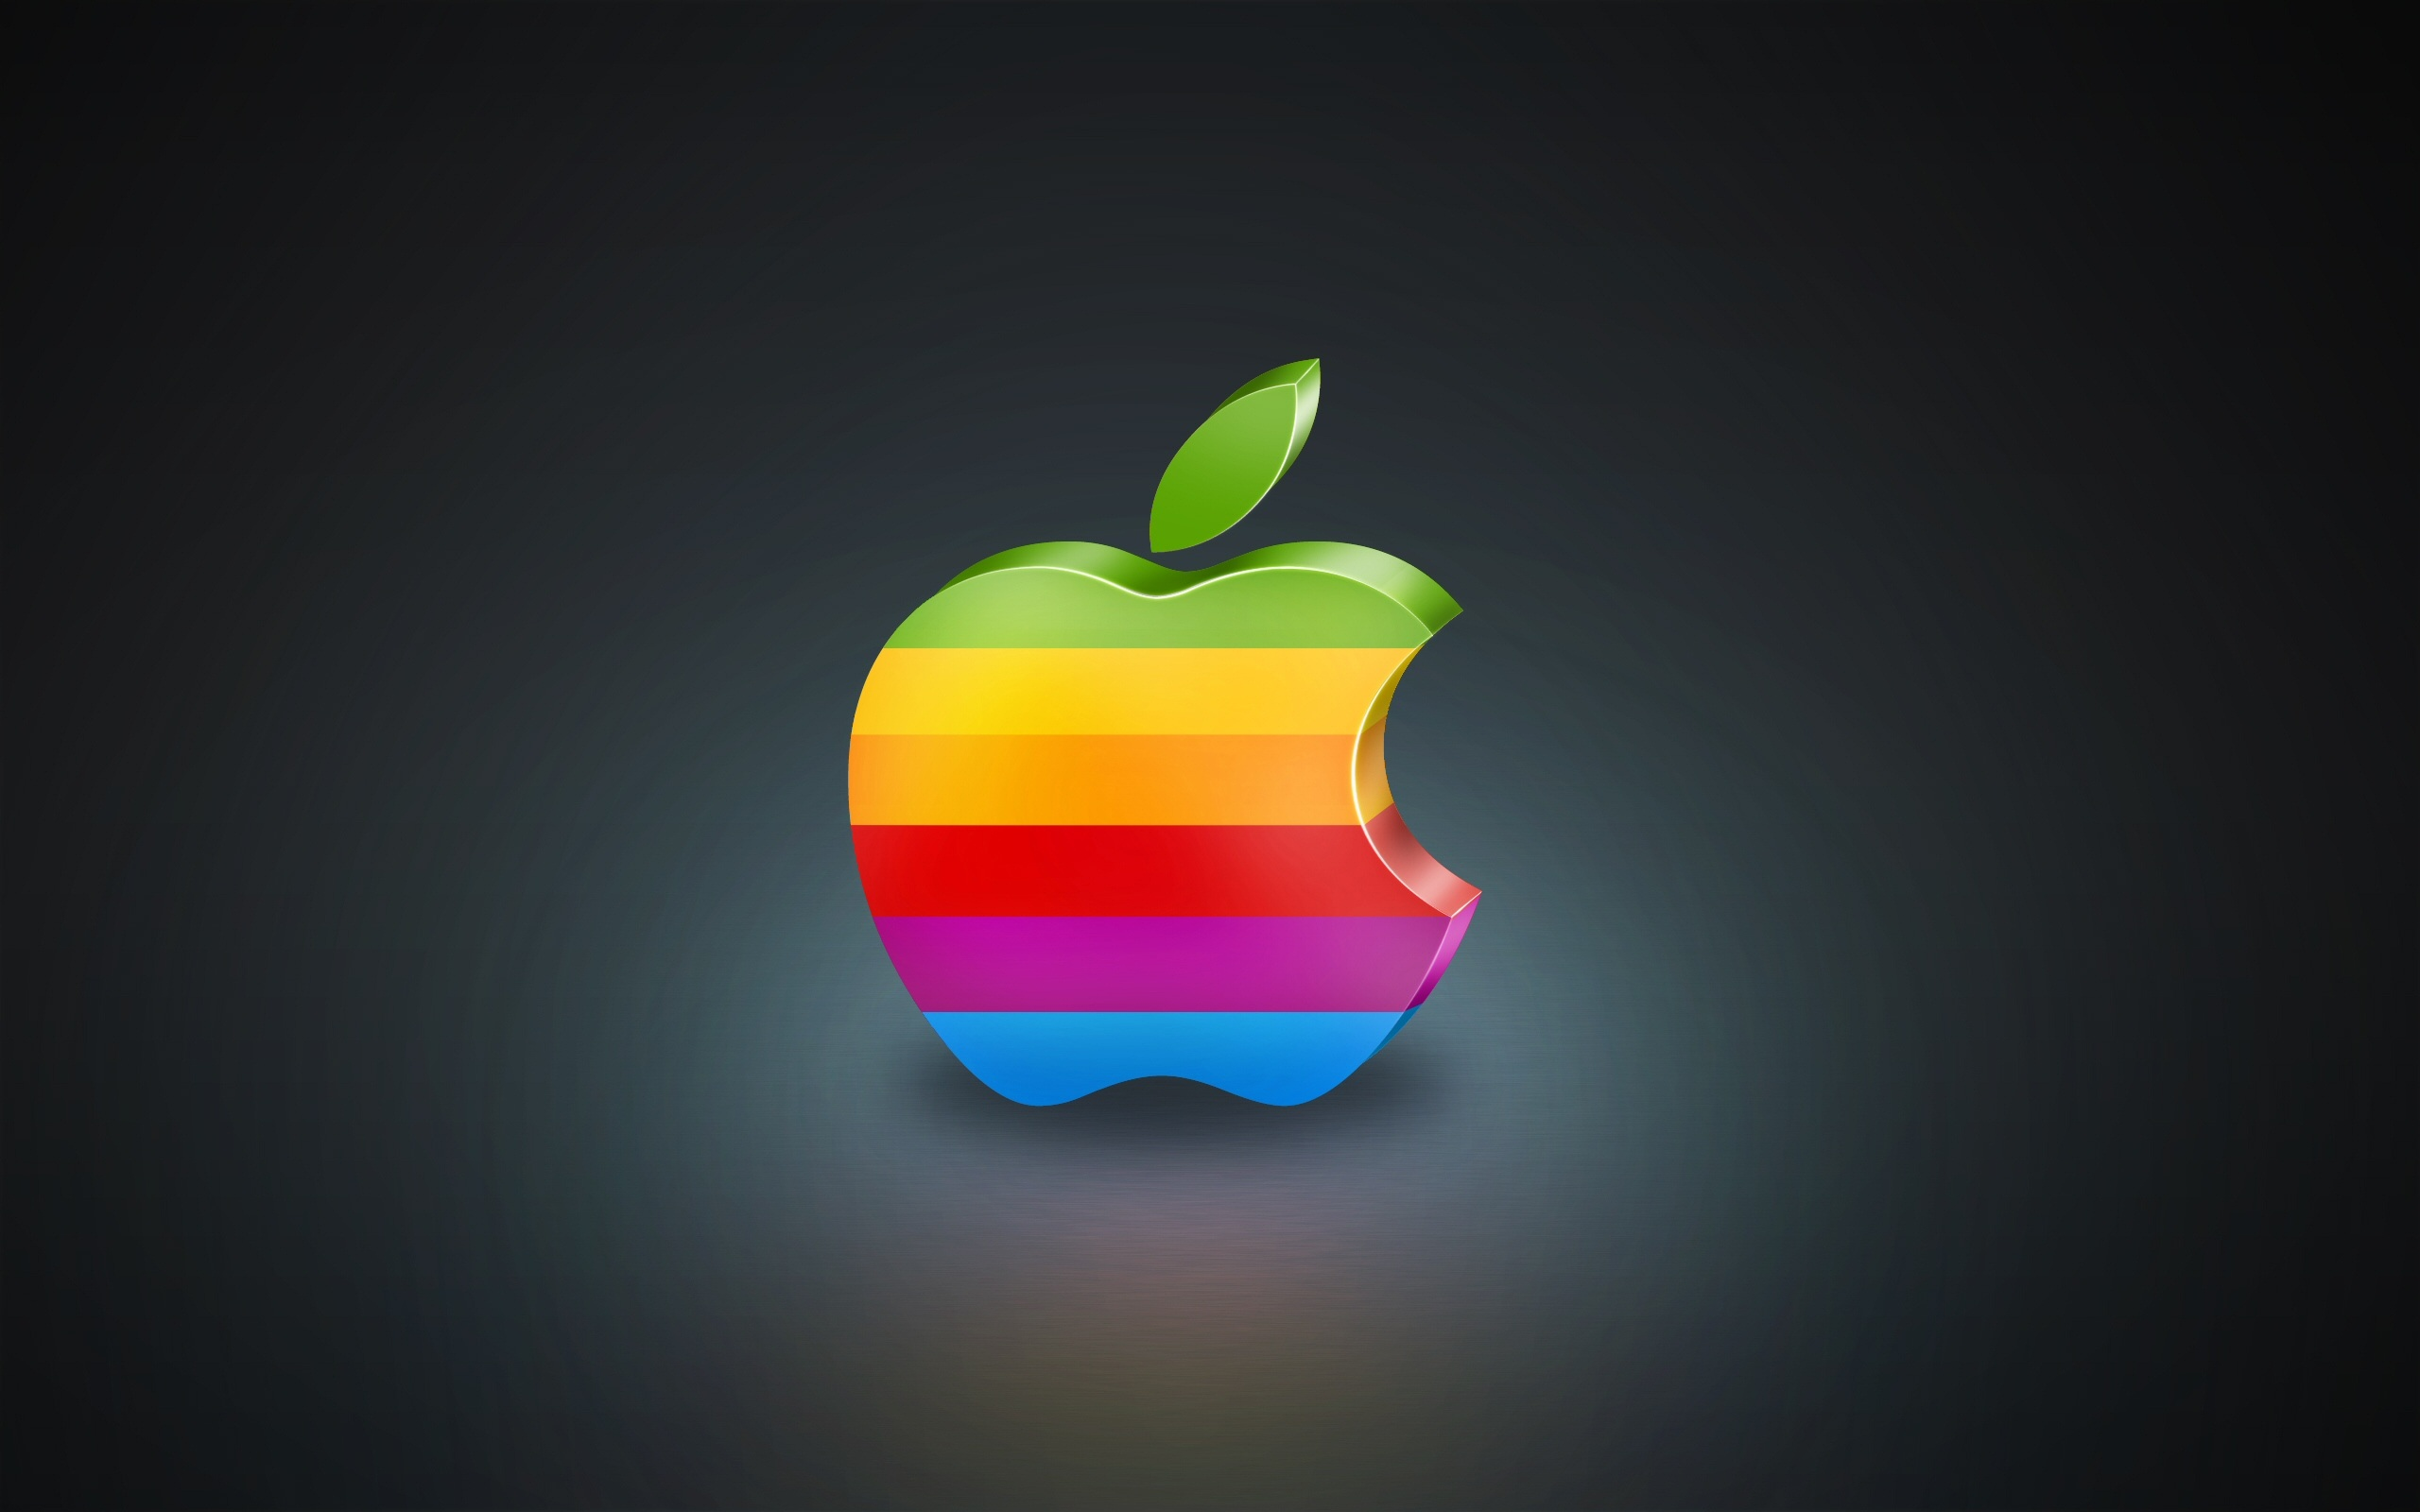 3d bunte apple hintergrundbilder 2560x1600